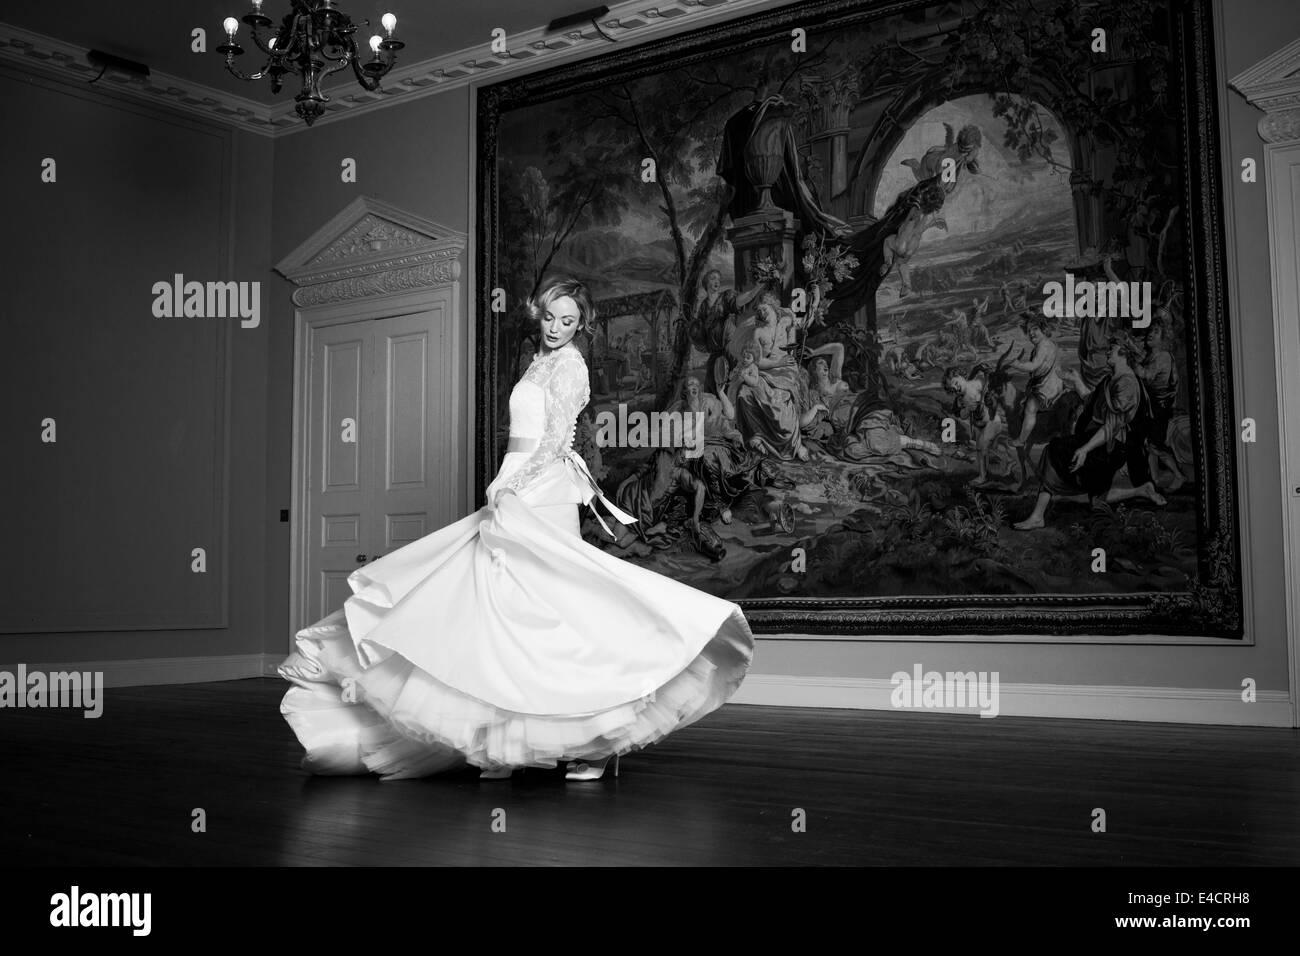 Wedding preparations, Bride dancing against old painting, Dorset, England - Stock Image